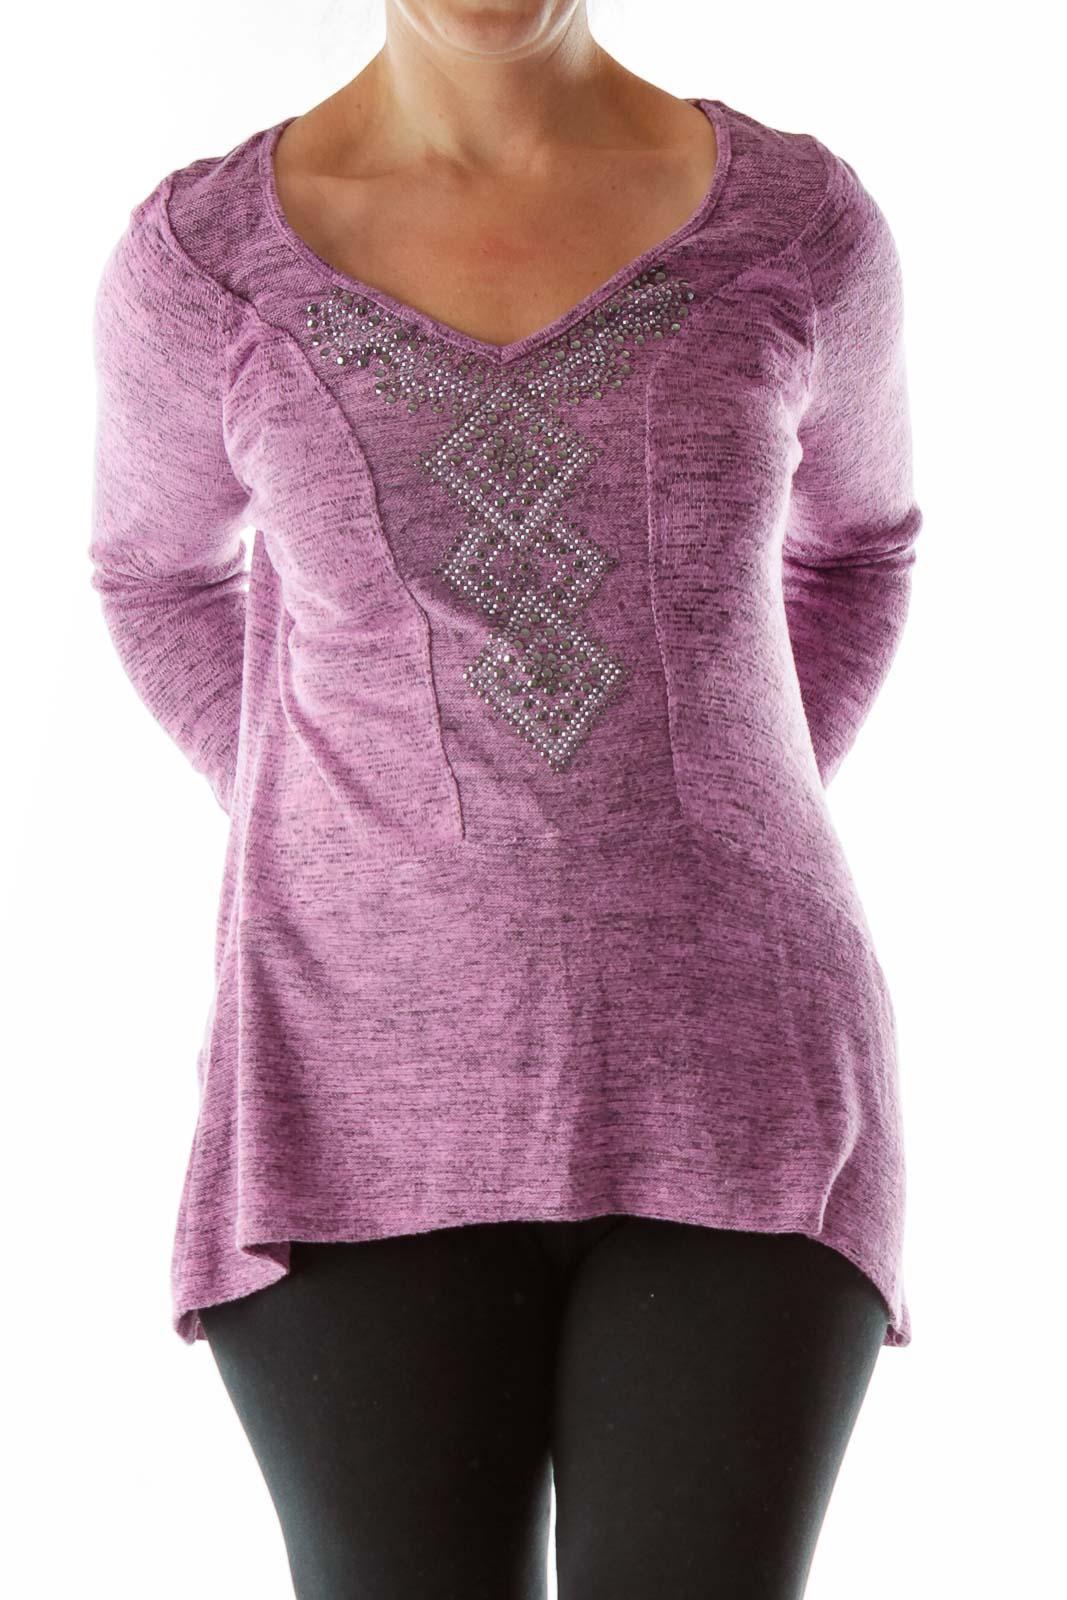 Purple Sweatshirt w/ Rhinestones